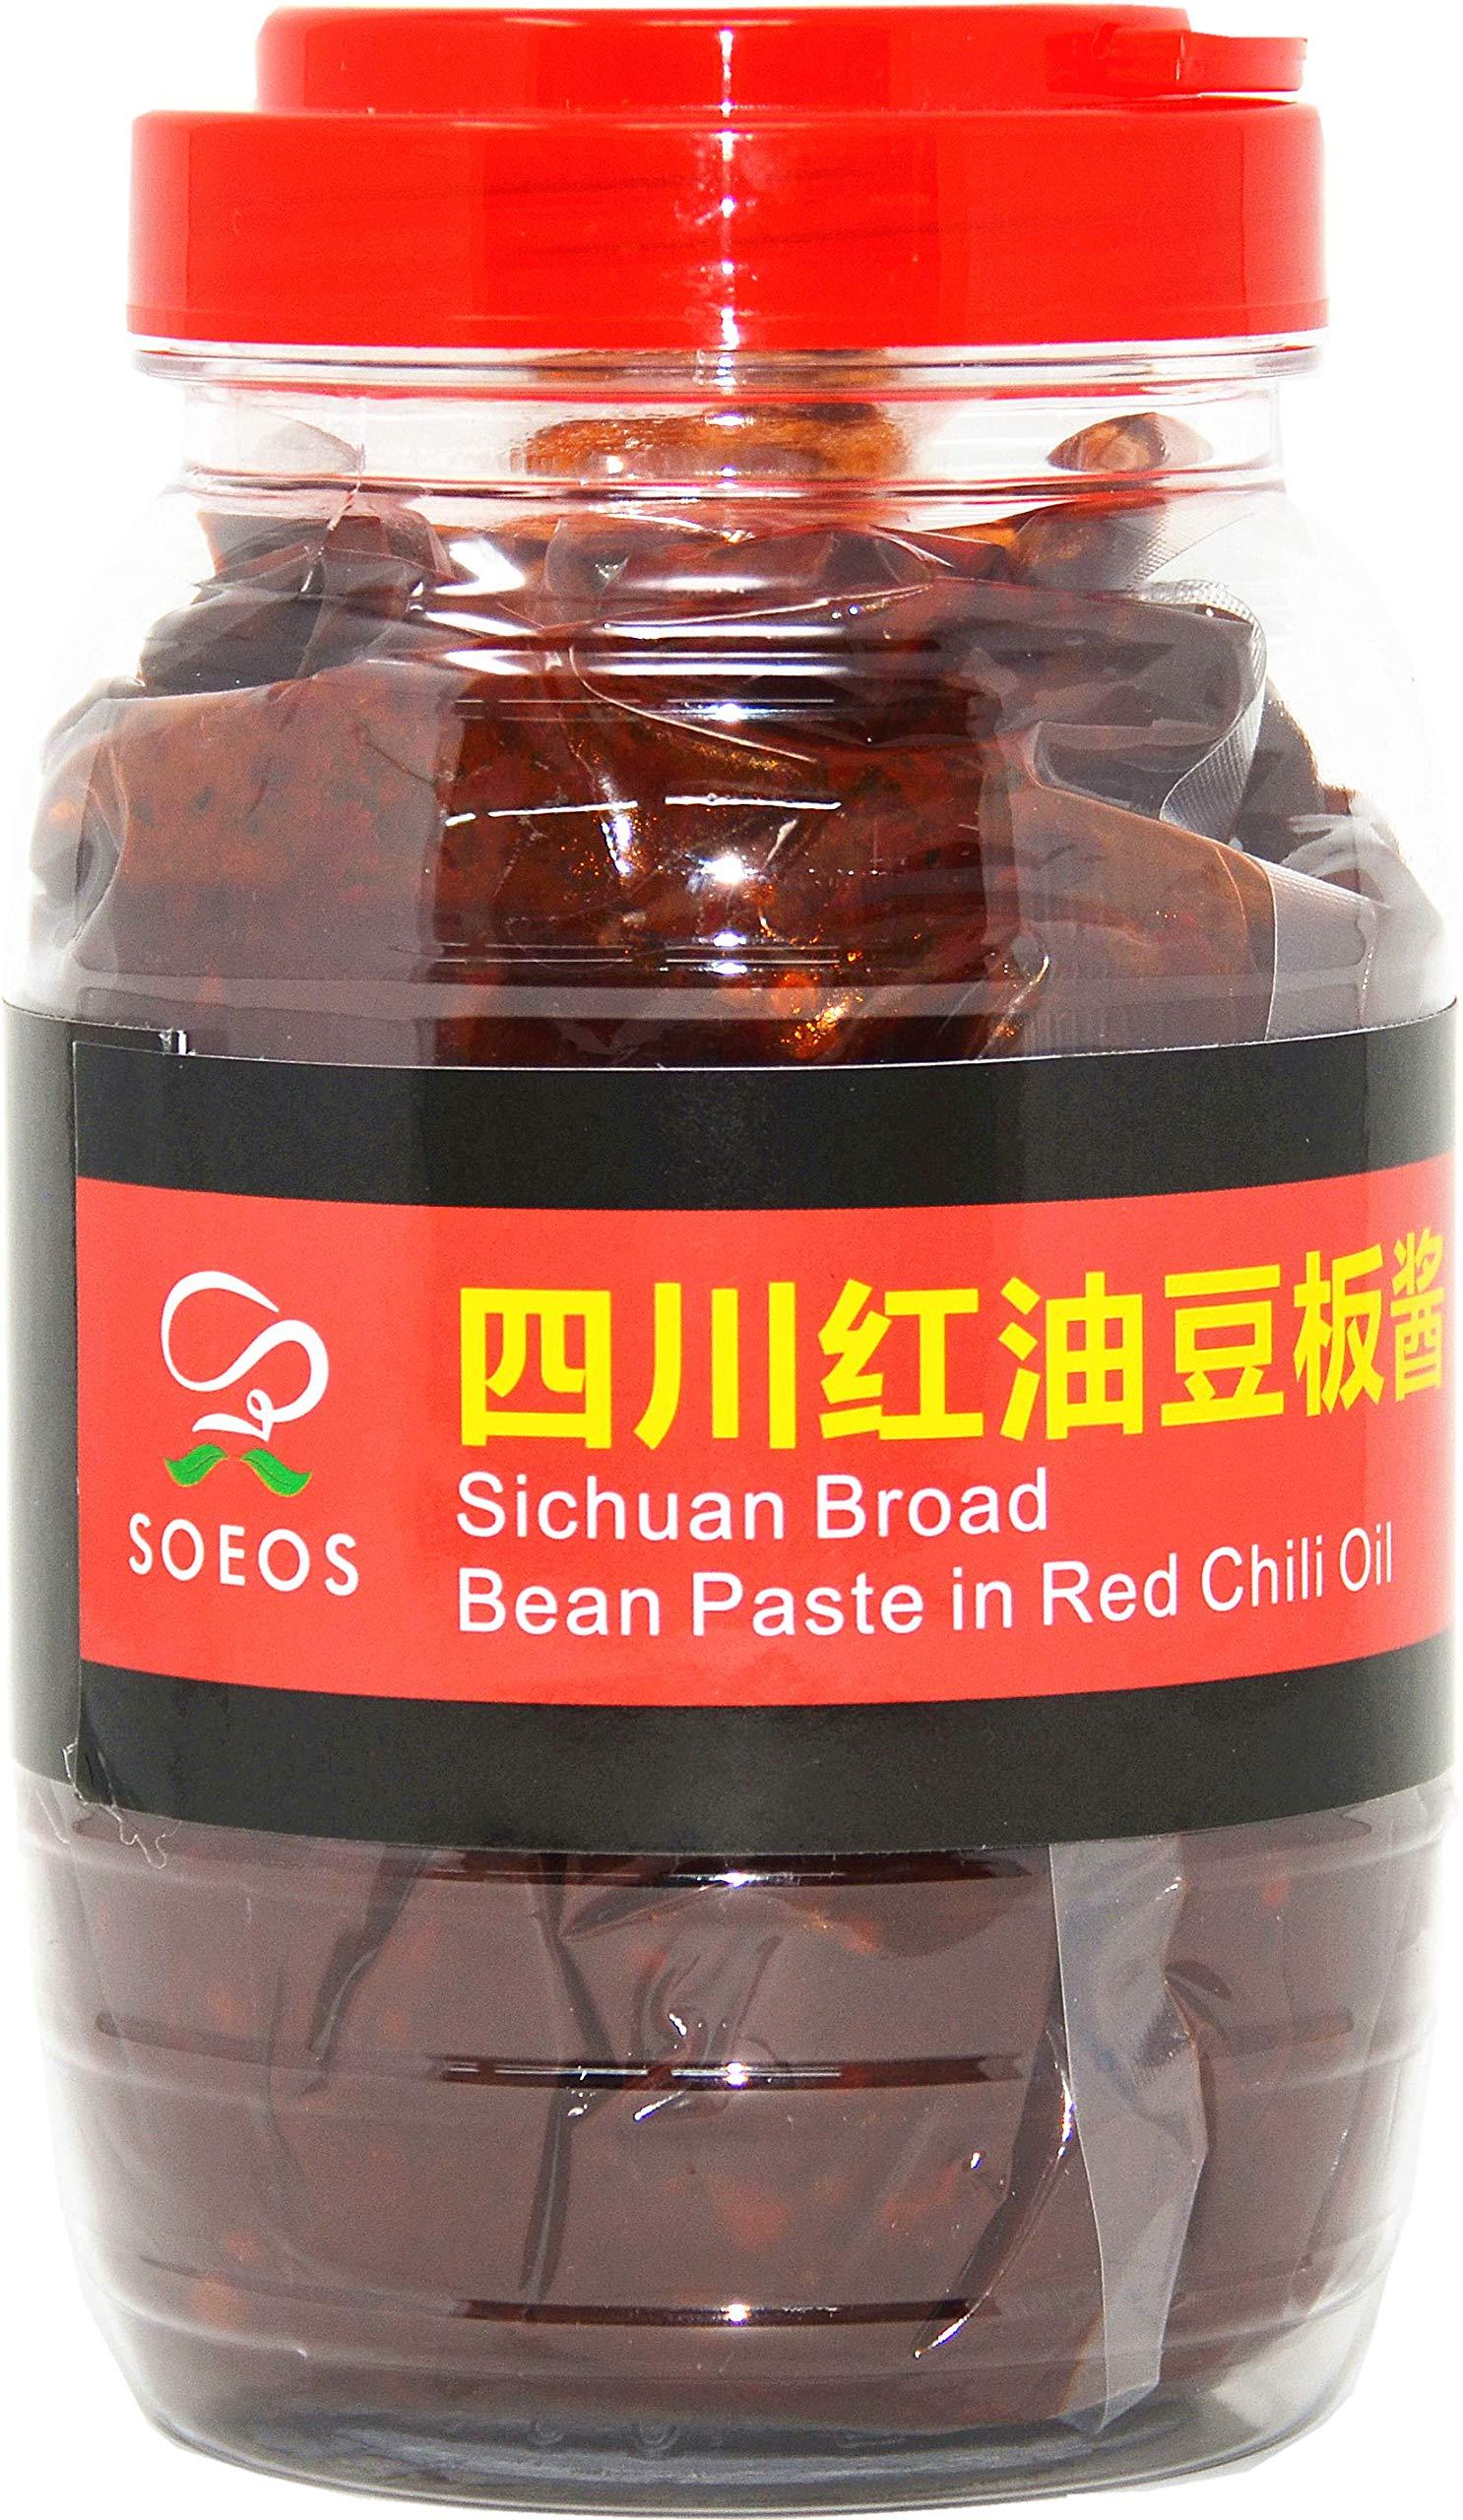 SOEOS Sichuan Pixian Broad Bean Paste with Chili Oil - 28.22oz (800g), Hongyou Doubanjiang with Red Chili Oil, Pixian Doubanjiang Chili Paste in Red Chili Oil.